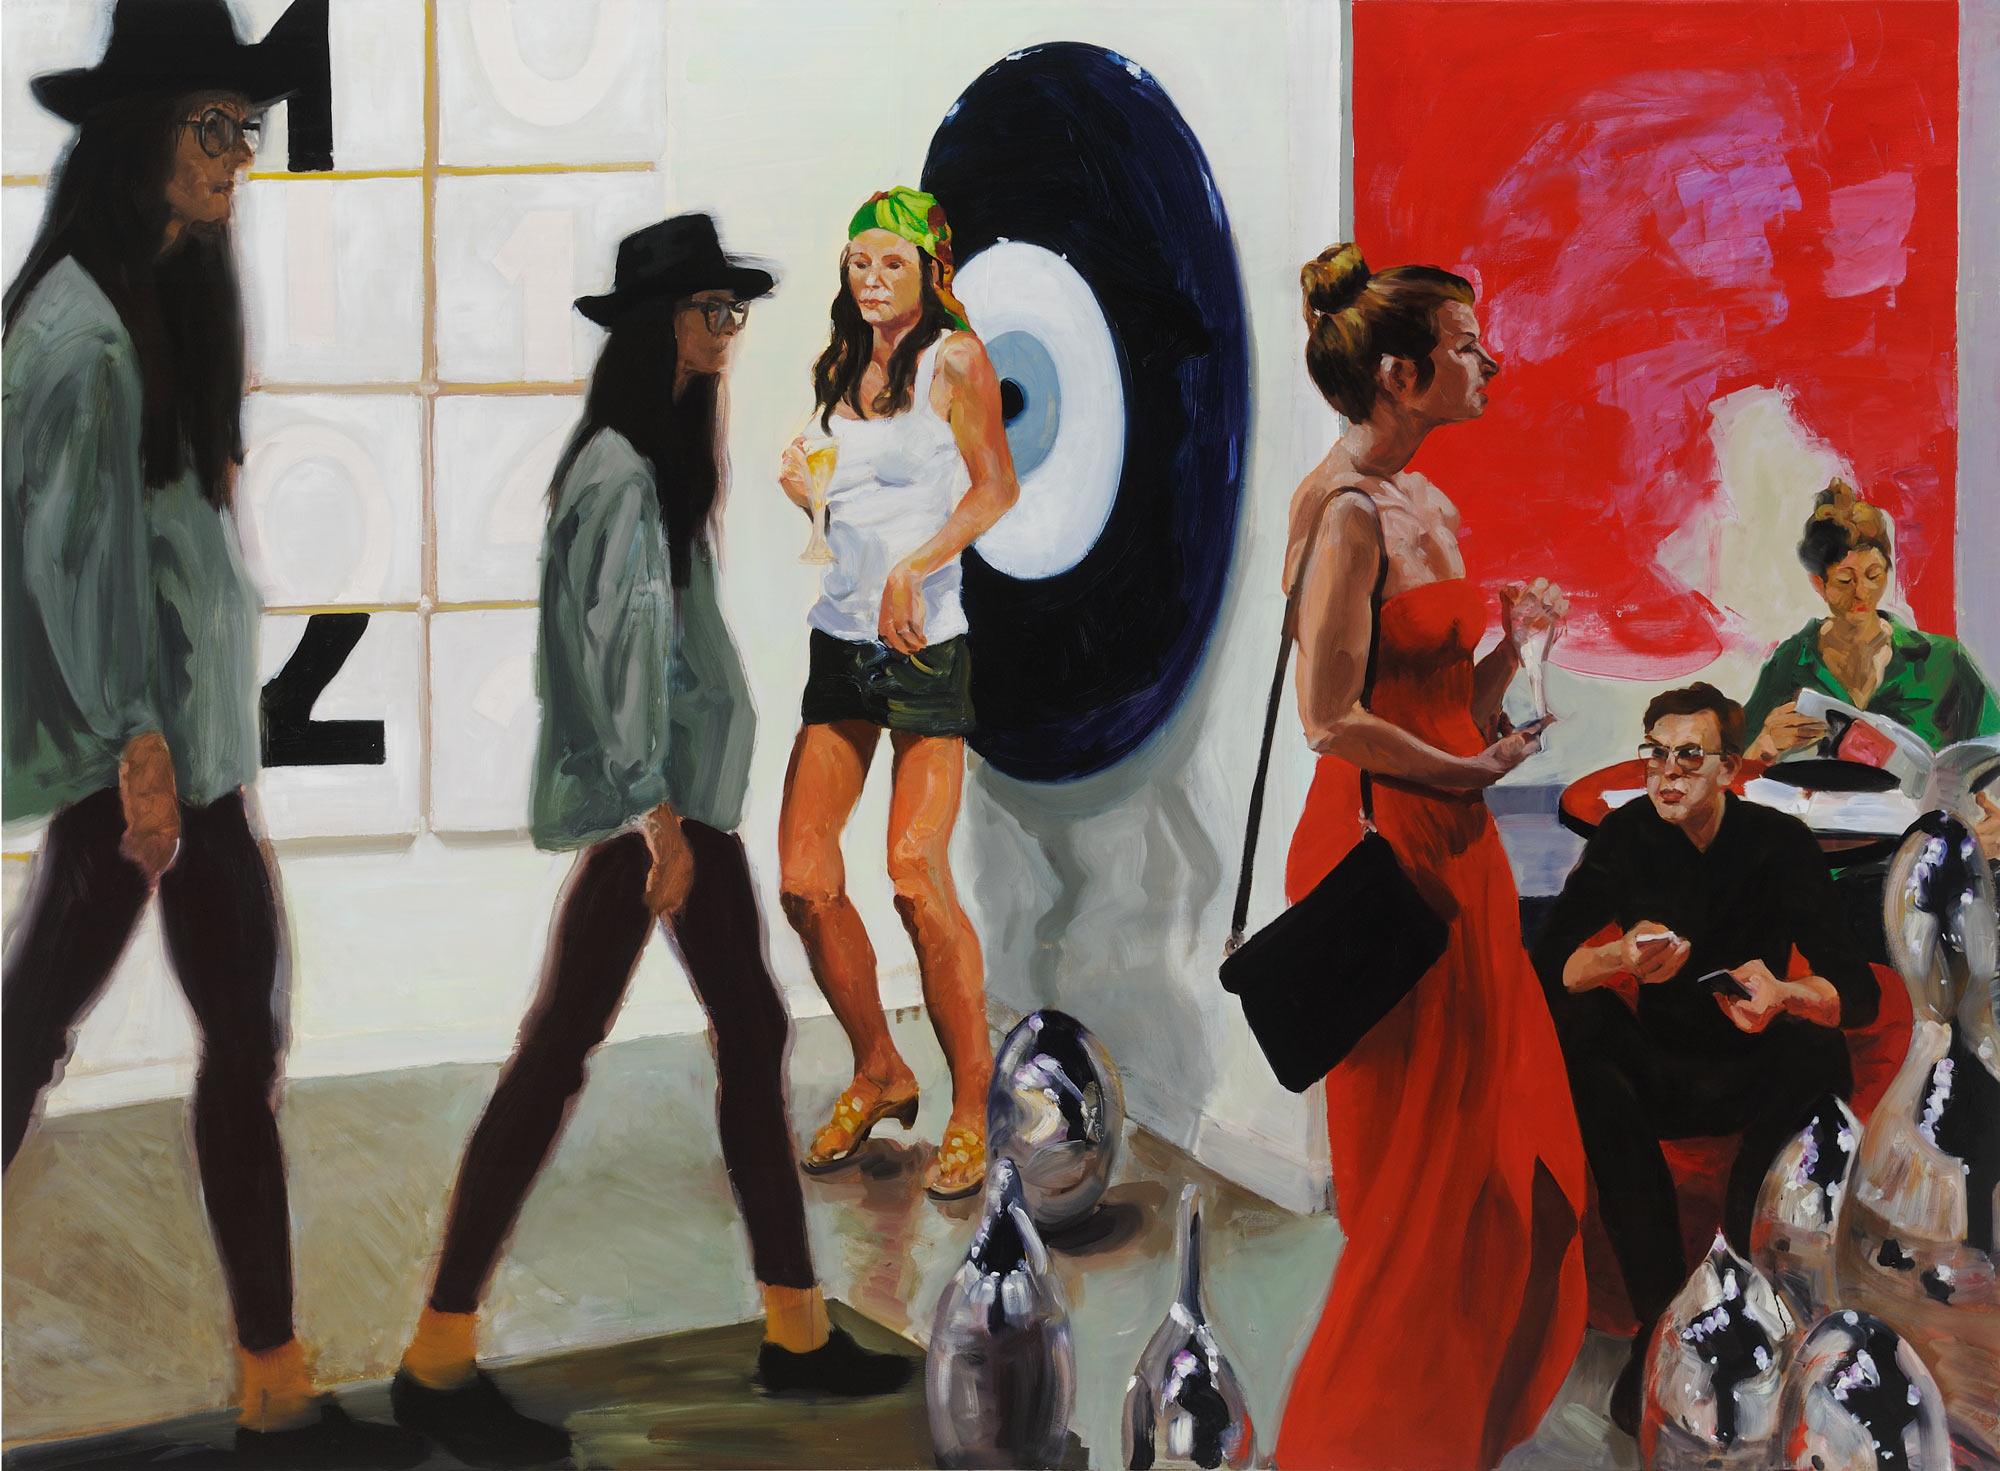 Art Fair: Booth #1 Play/Care, 2013. Oil on Linen. 82 x 112 in. (208 x 284 cm.)